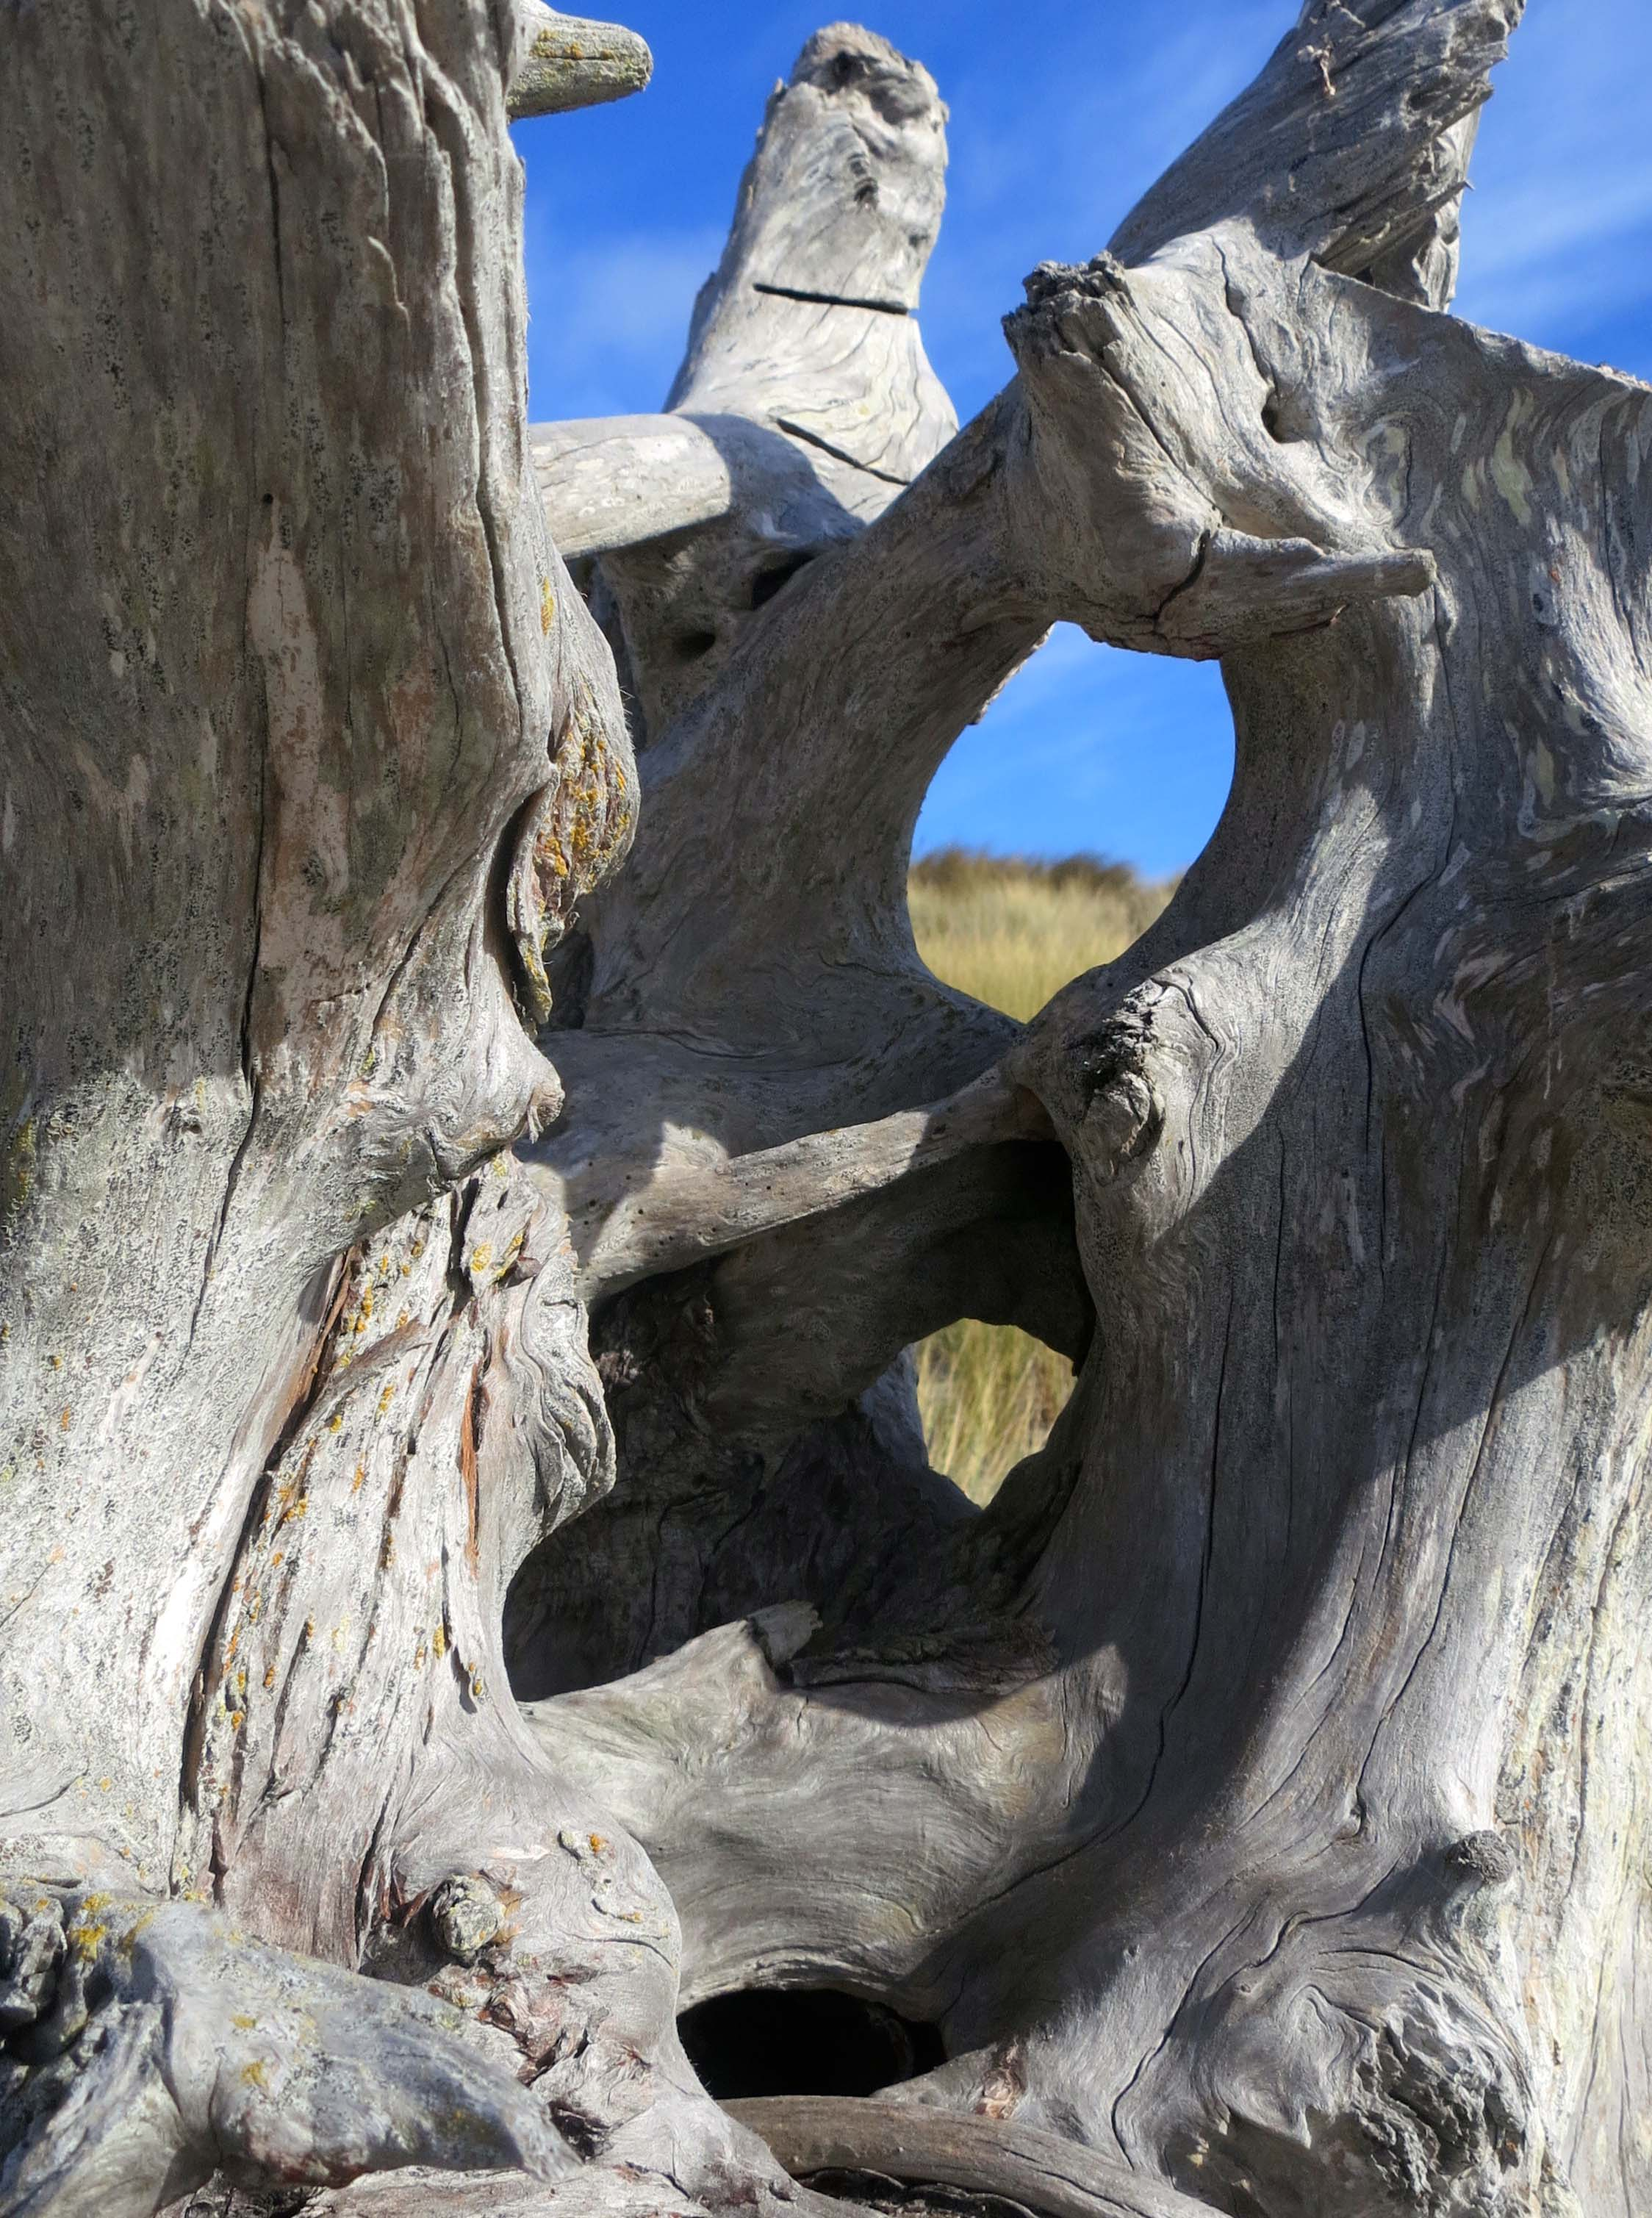 Close up photo of driftwood on Limantour Beach taken by Curtis Mekemson.